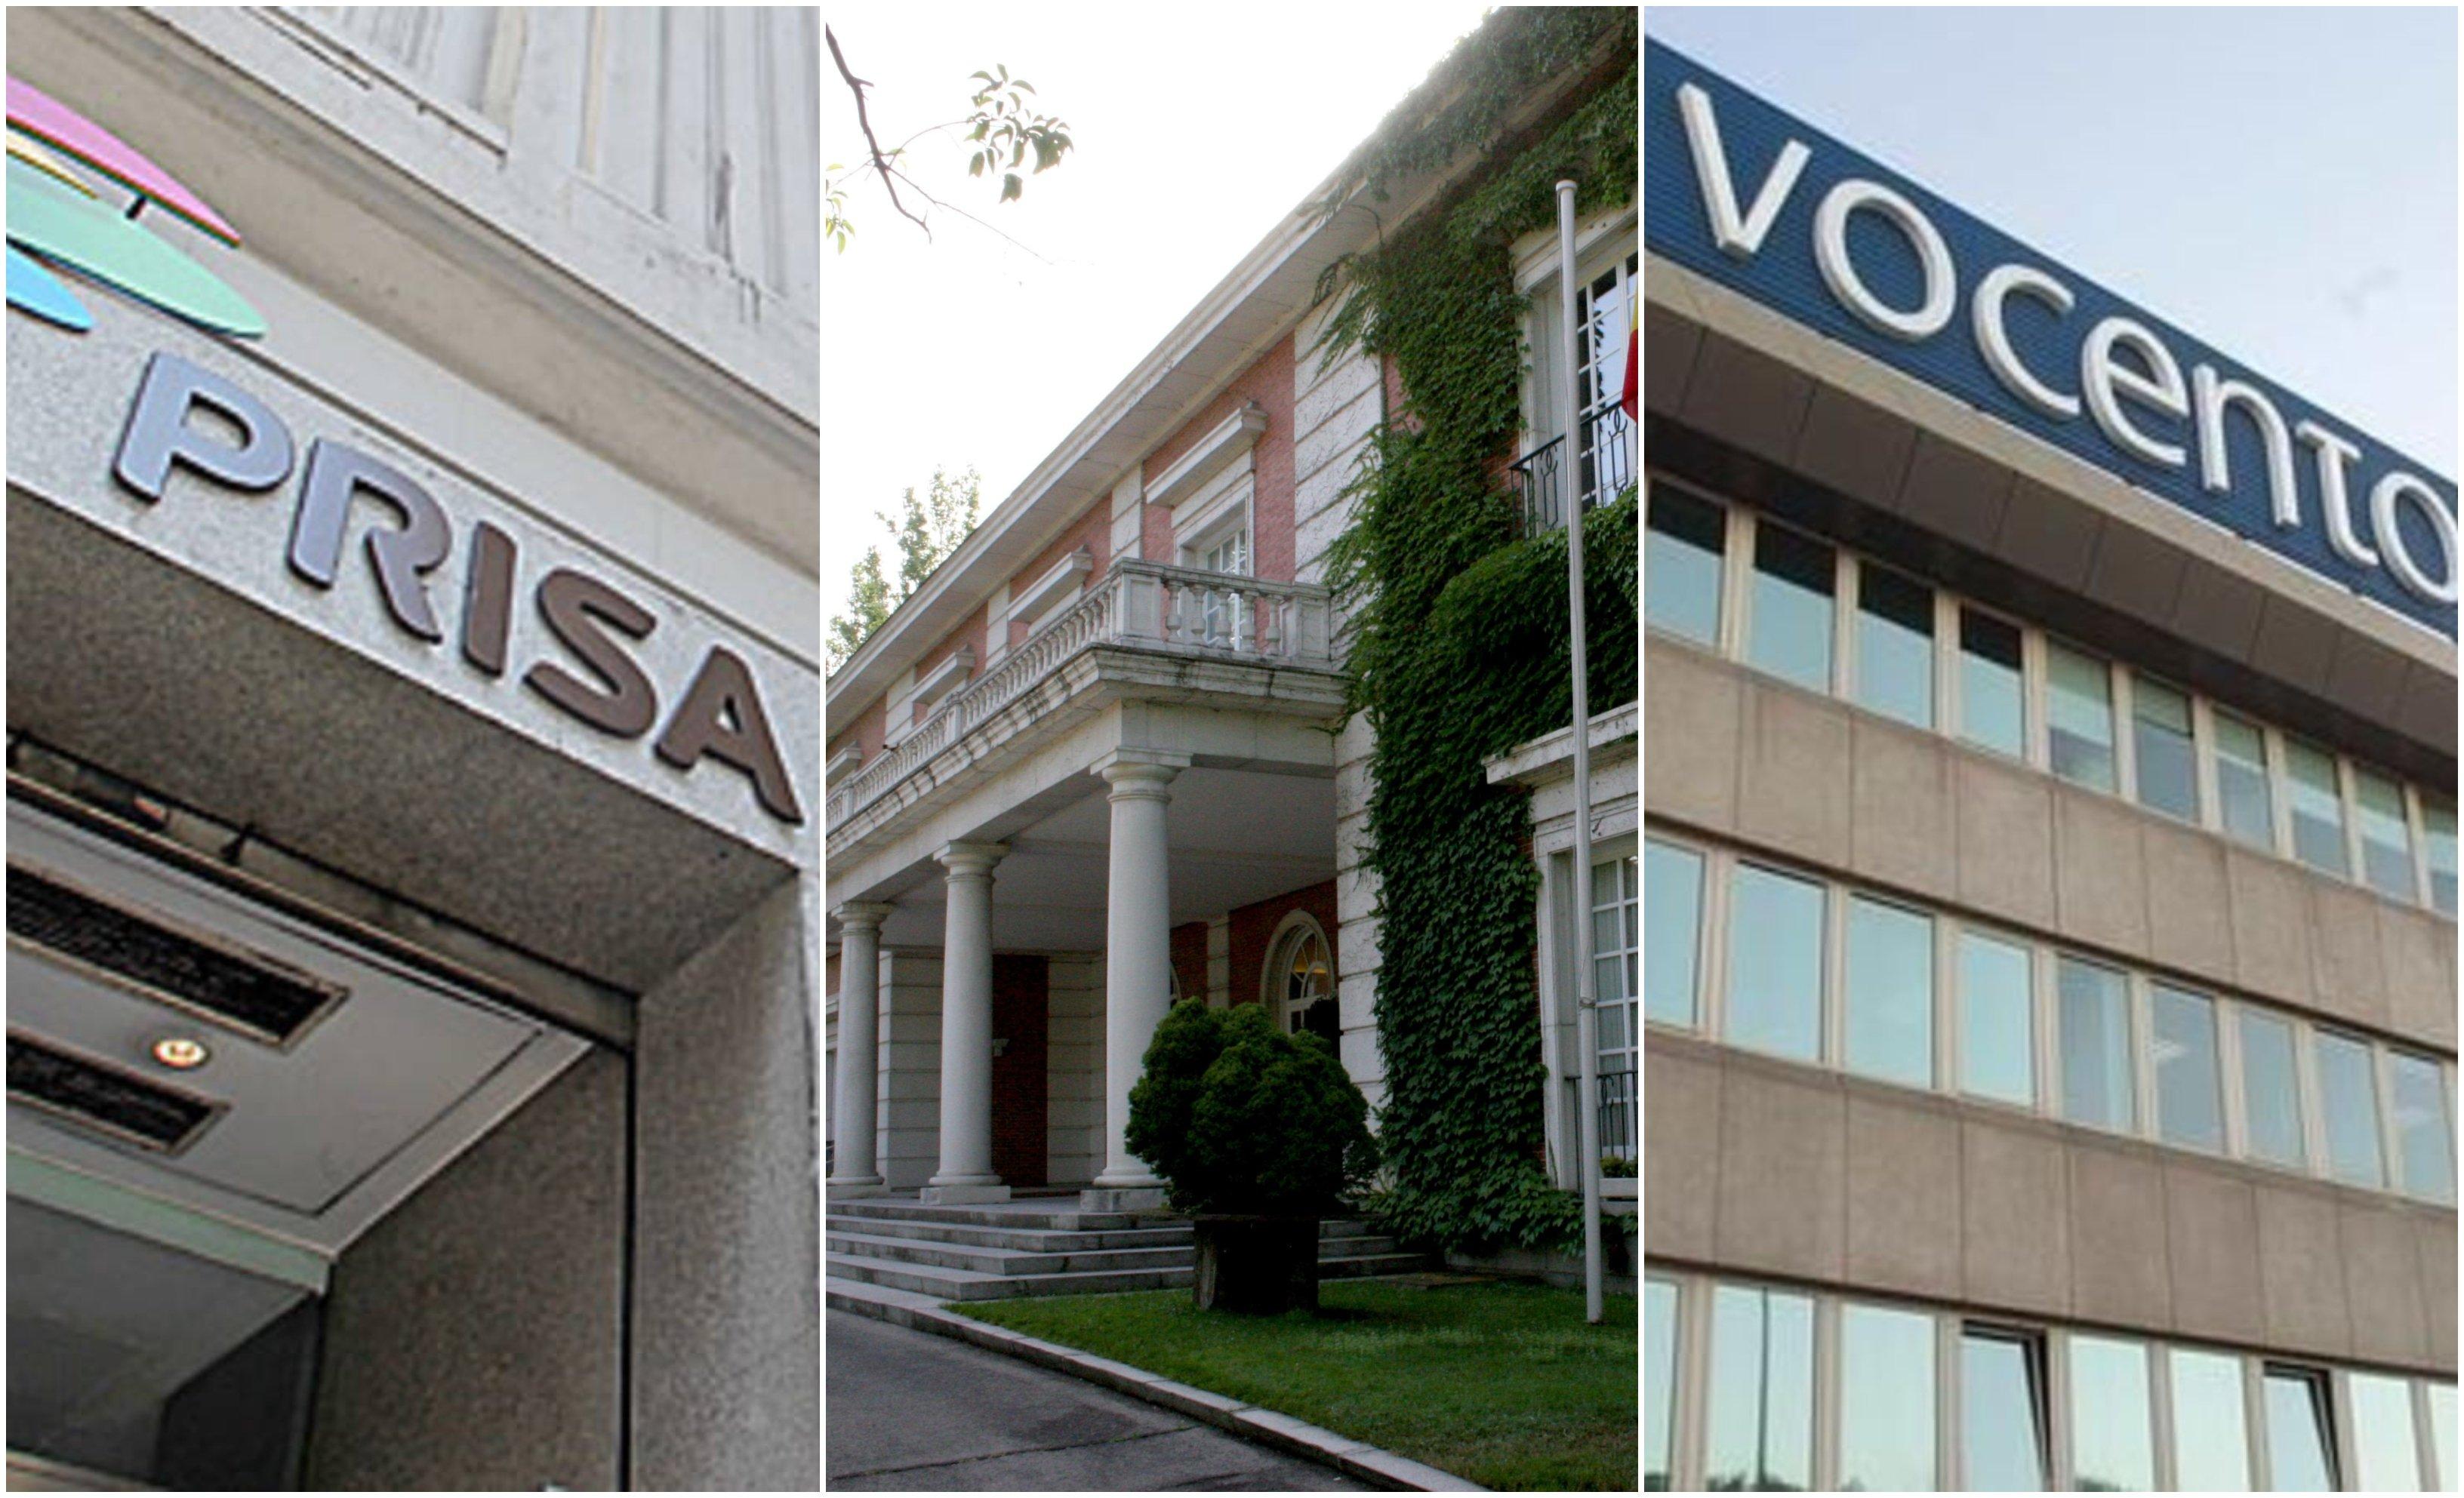 Moncloa, sede 'El País', sede 'ABC'